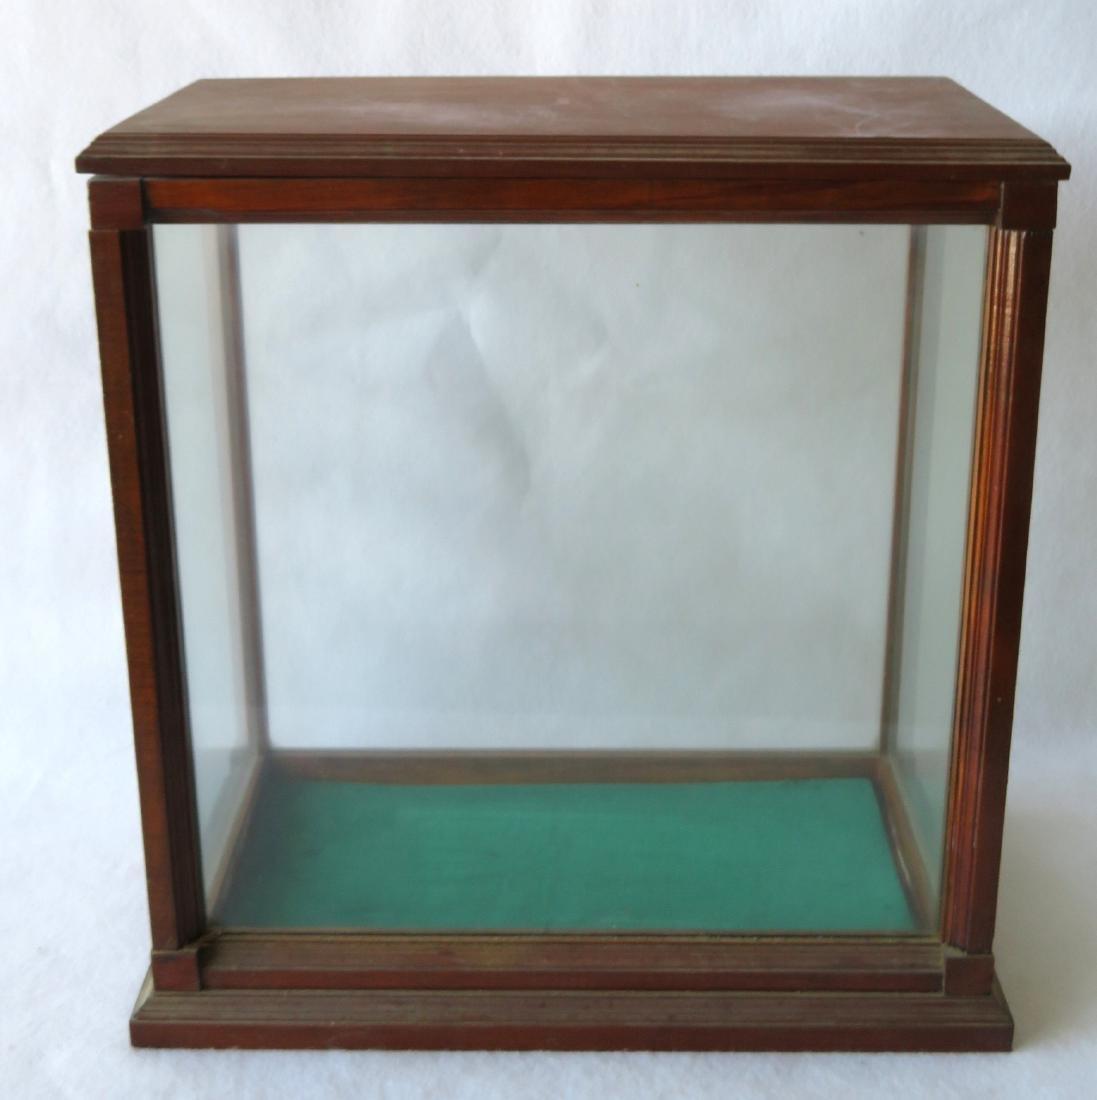 "Oak framed table top display case - 20""W x 11.5""D x - 2"